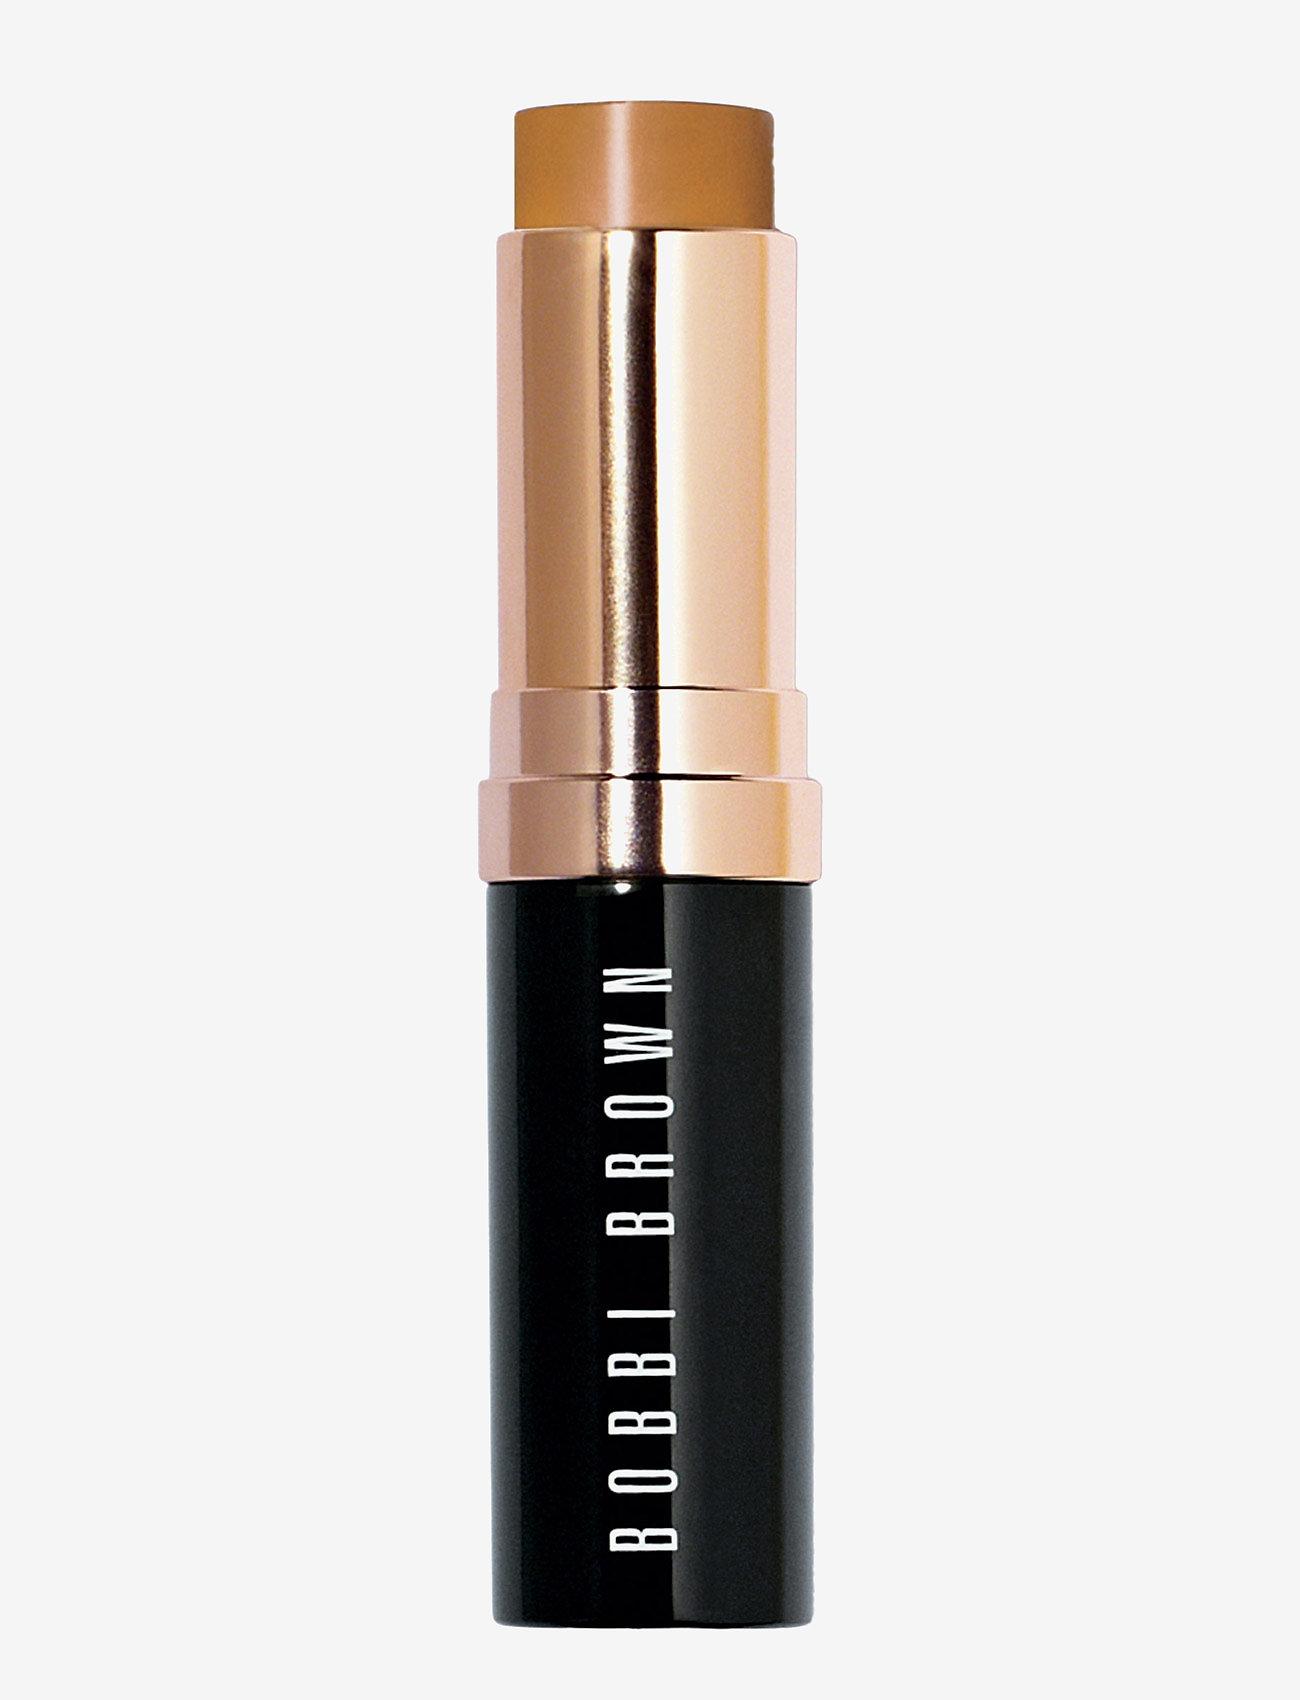 Bobbi Brown - Skin Foundation Stick, Cool Golden 6,25 - foundation - cool golden 6,25 - 0